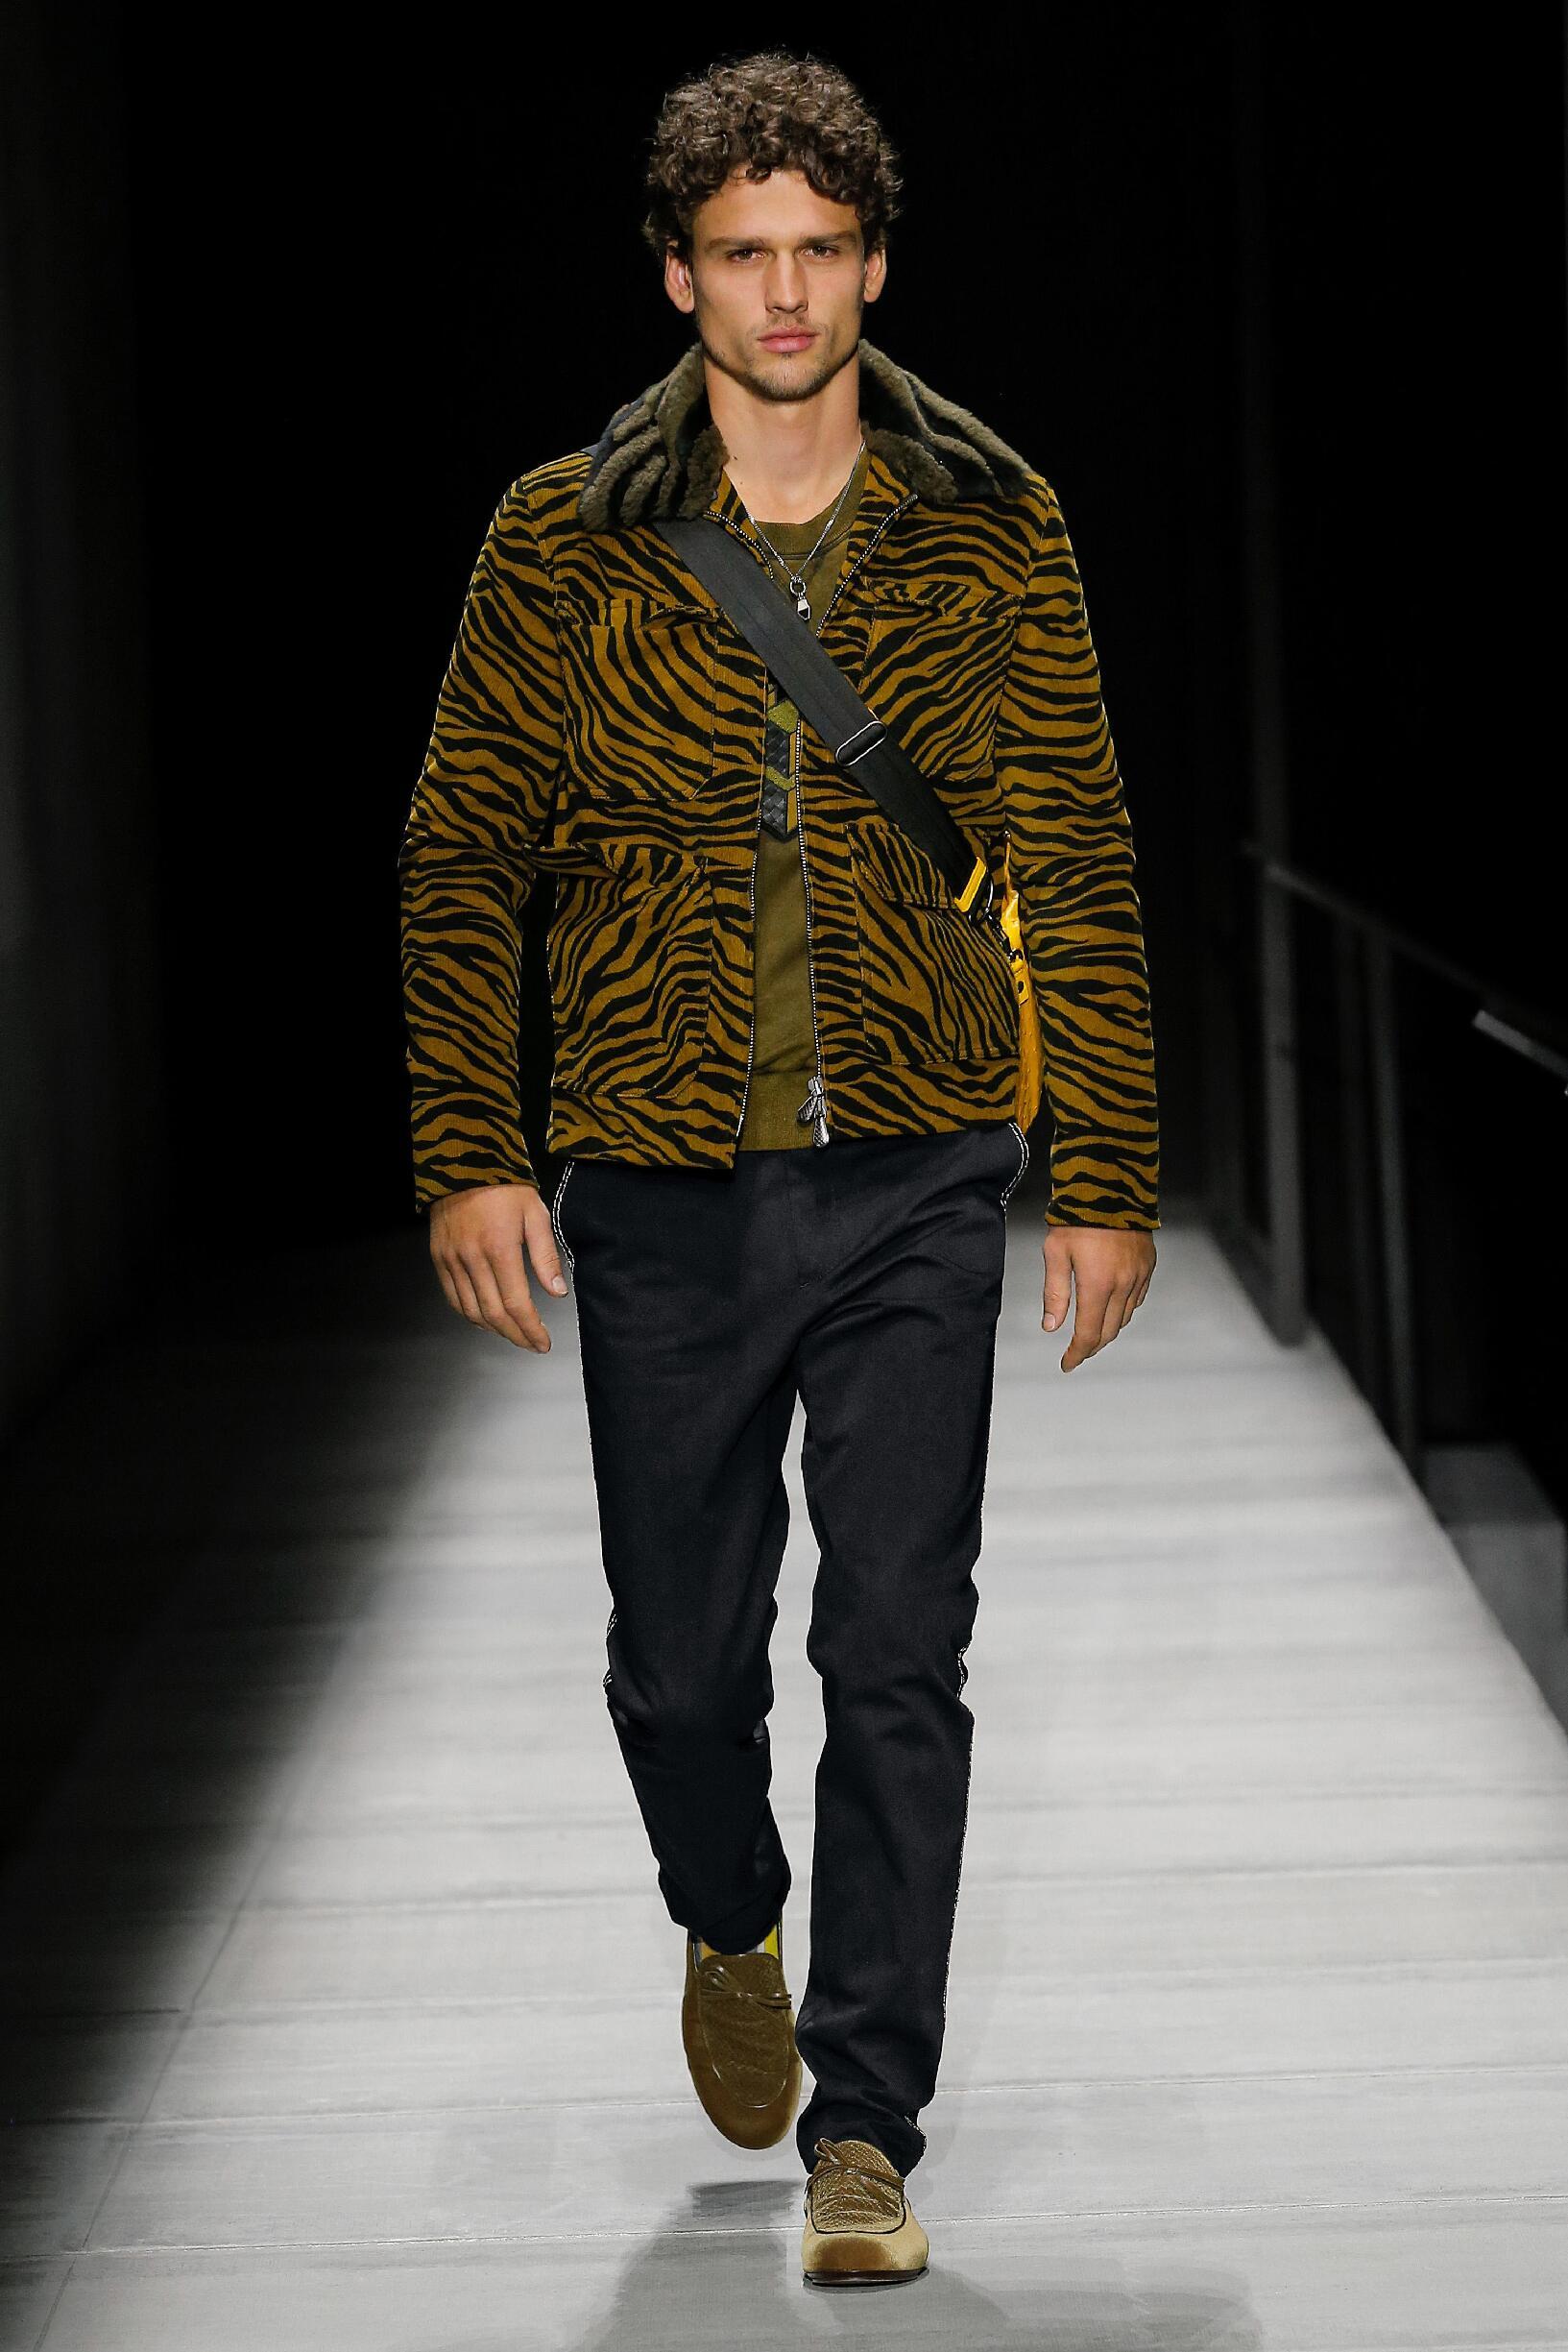 Bottega Veneta Fall Winter 2018 Mens Collection New York Fashion Week